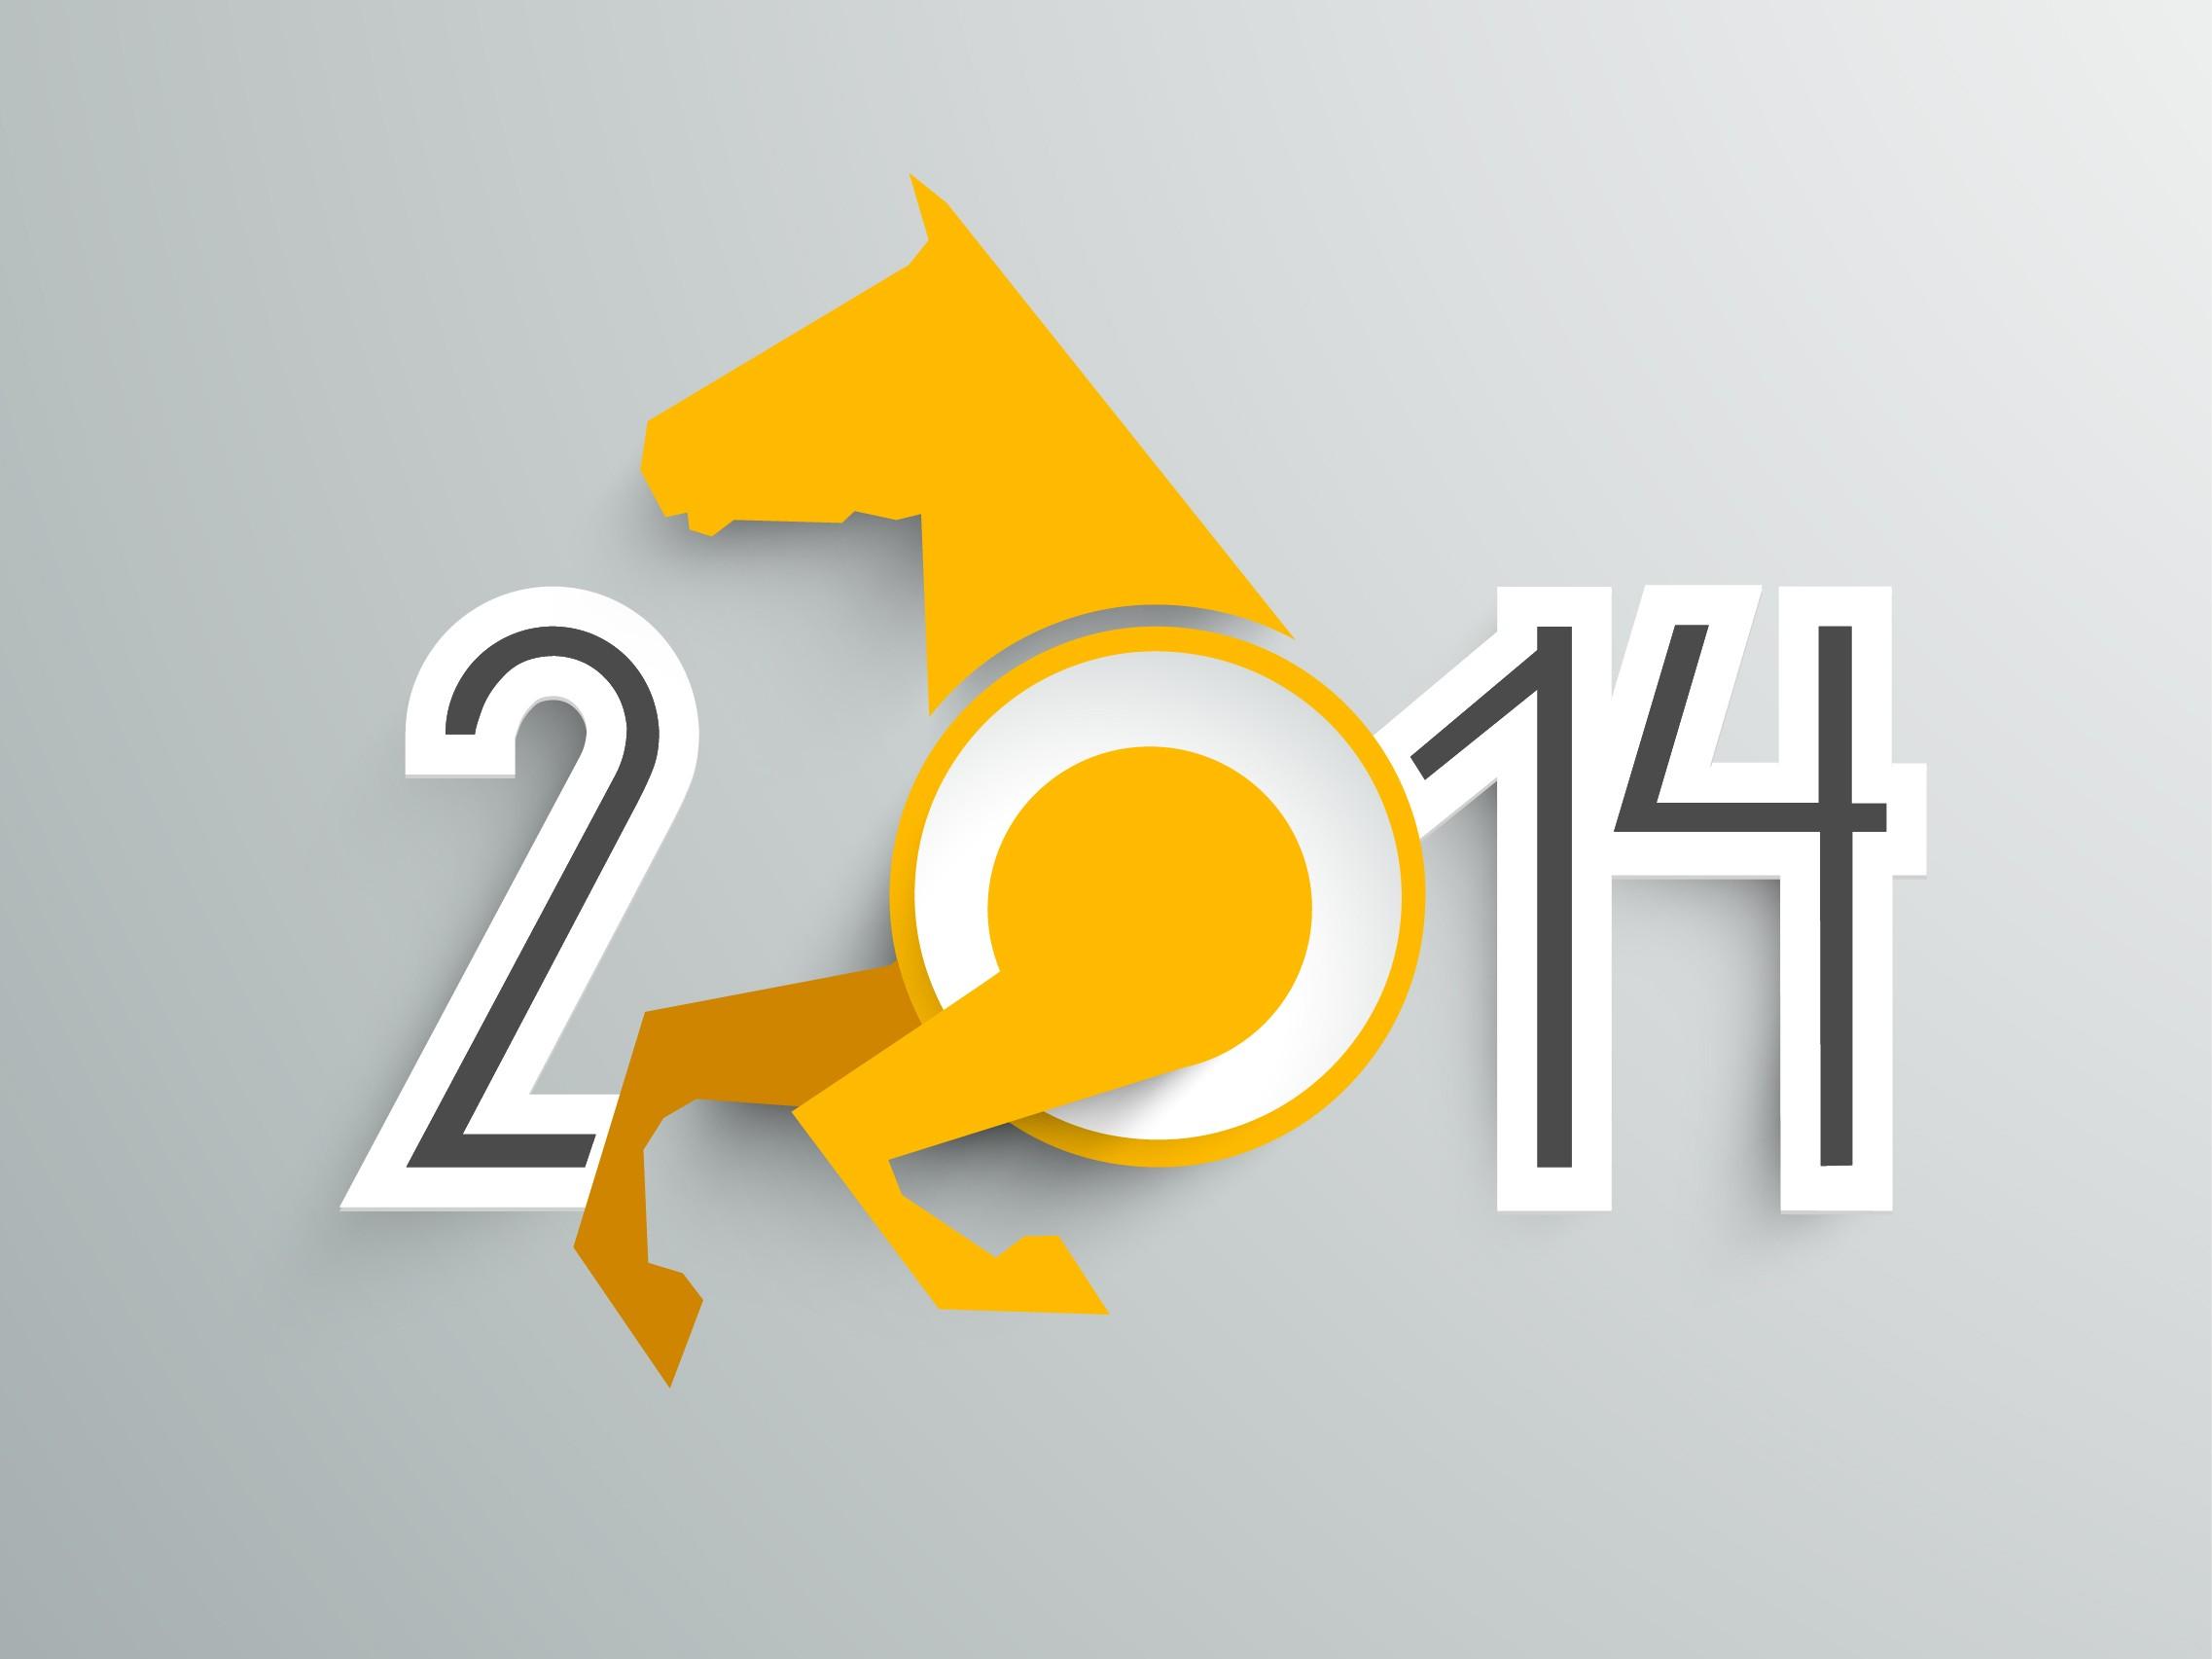 ������ ��� ���� ������� 2014 ����� , ��� ����� ����� ������ ���� ����� 2014